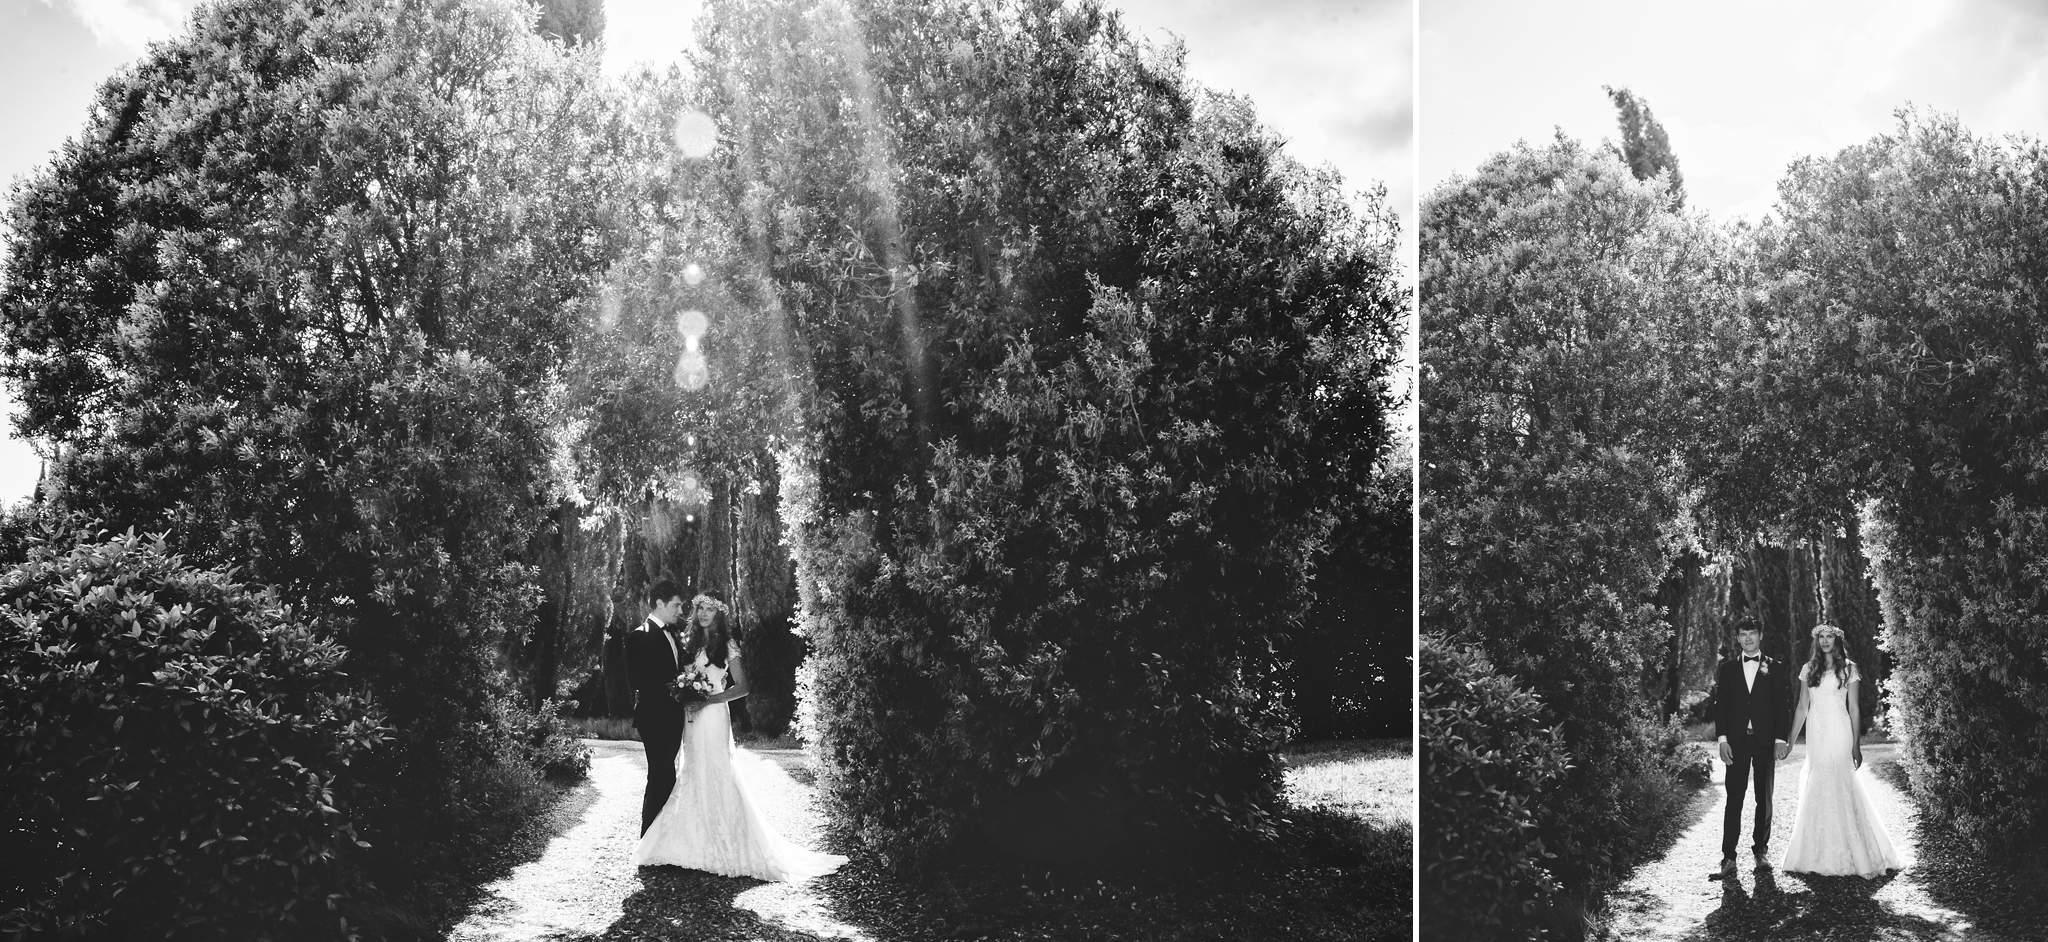 30wedding-photographer-tuscany-siena